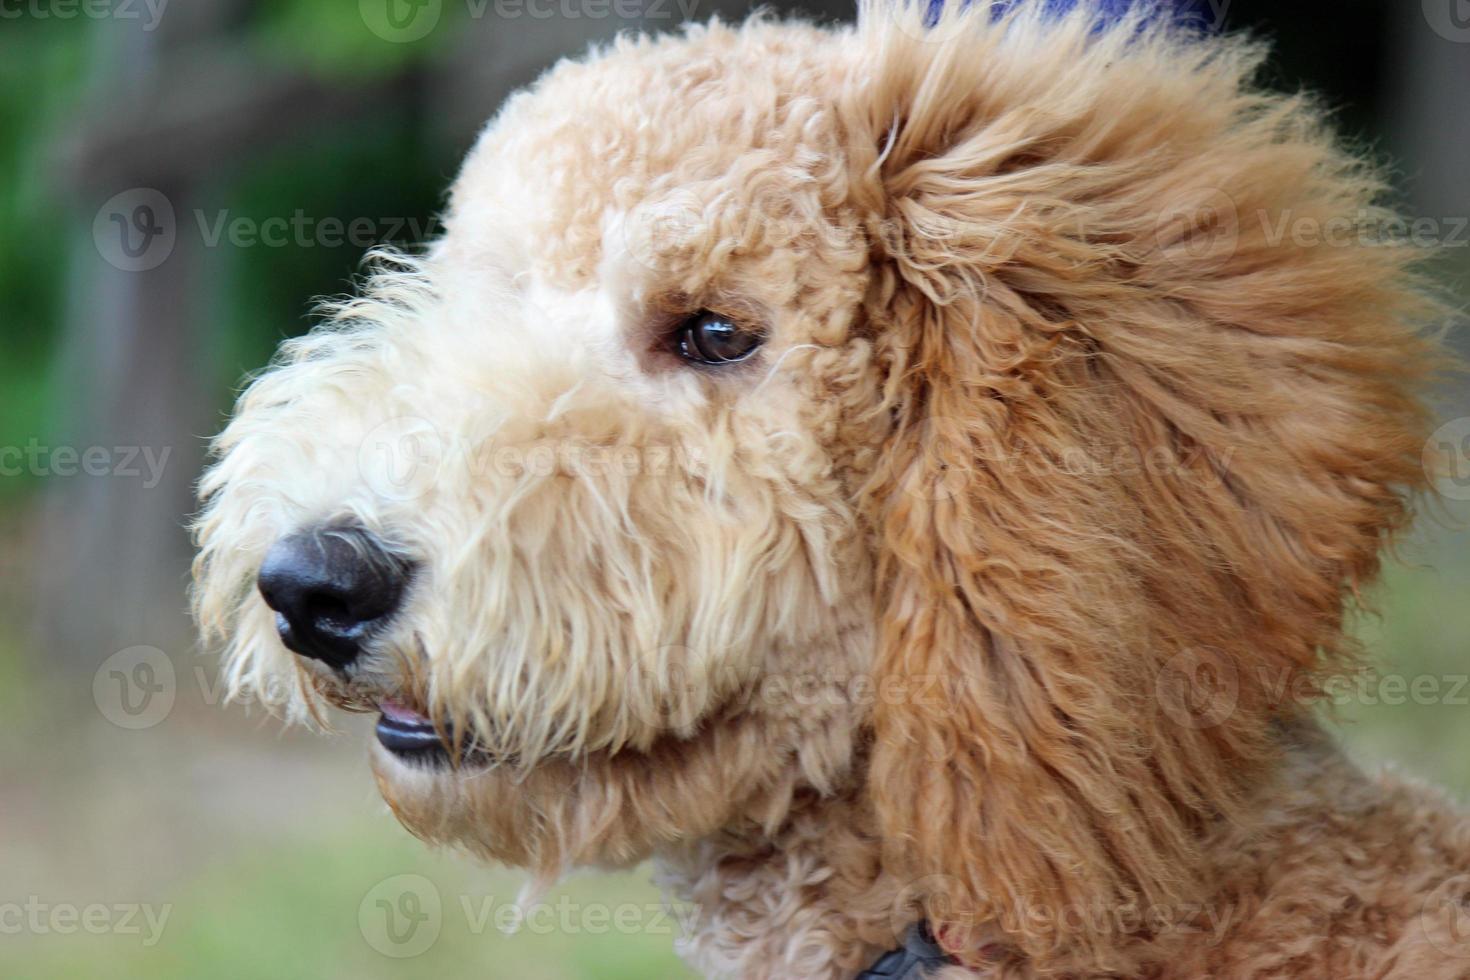 cucciolo d'oro doodle - da vicino foto